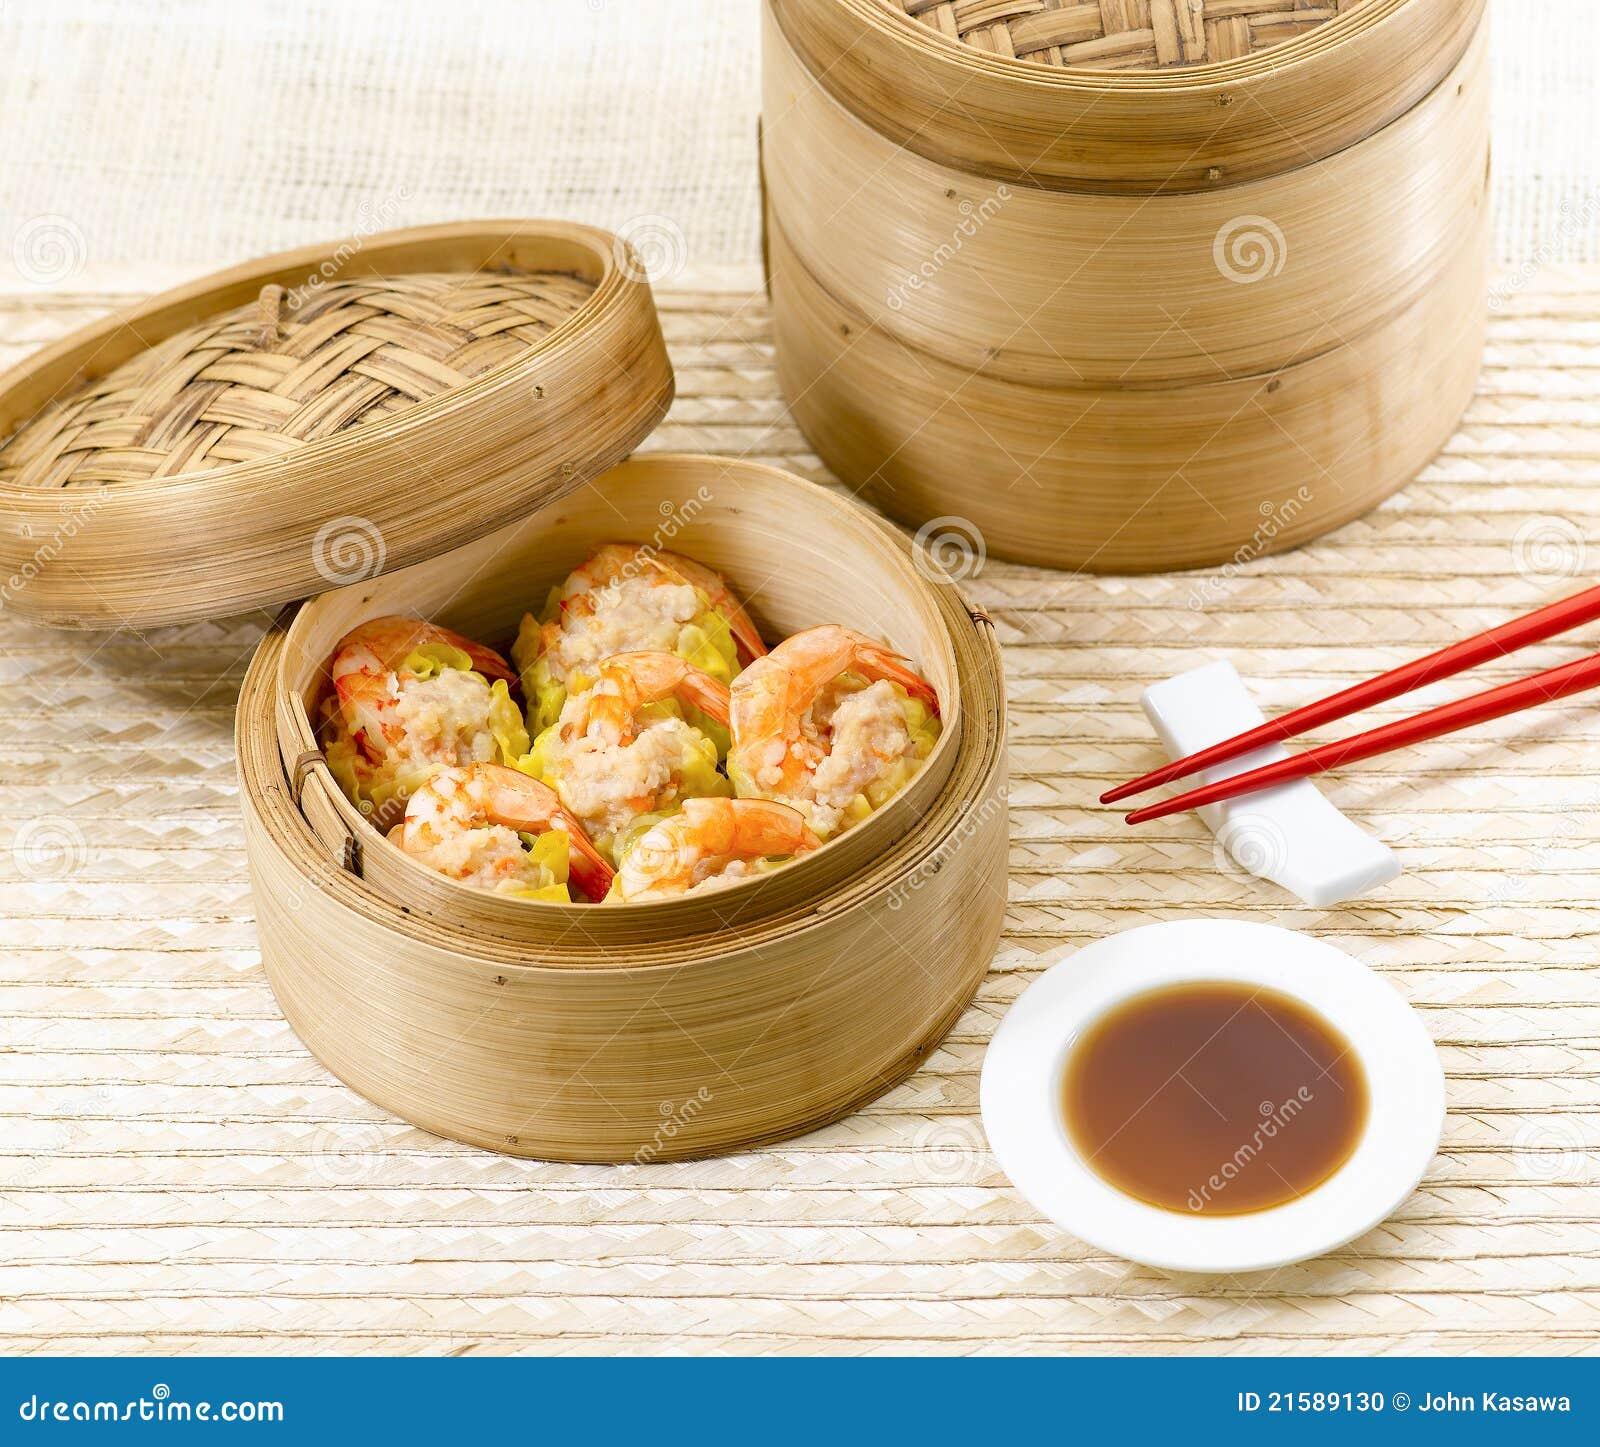 chinese shrimp dim sum food style stock photo image 21589130. Black Bedroom Furniture Sets. Home Design Ideas